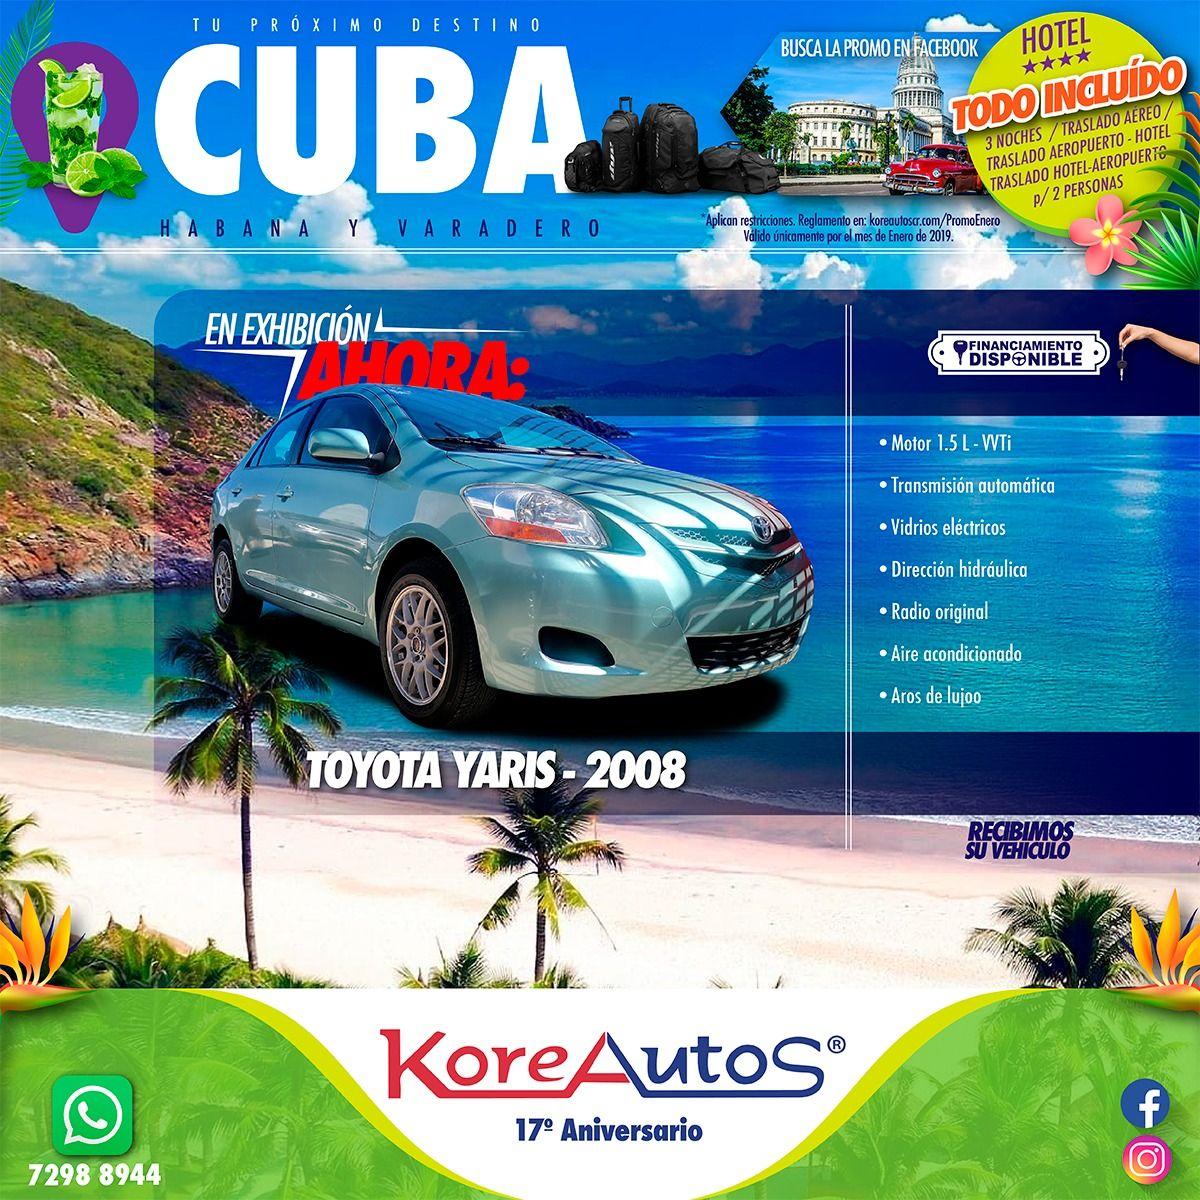 Toyota Yaris 2008 Toyota, Hyundai, Yaris